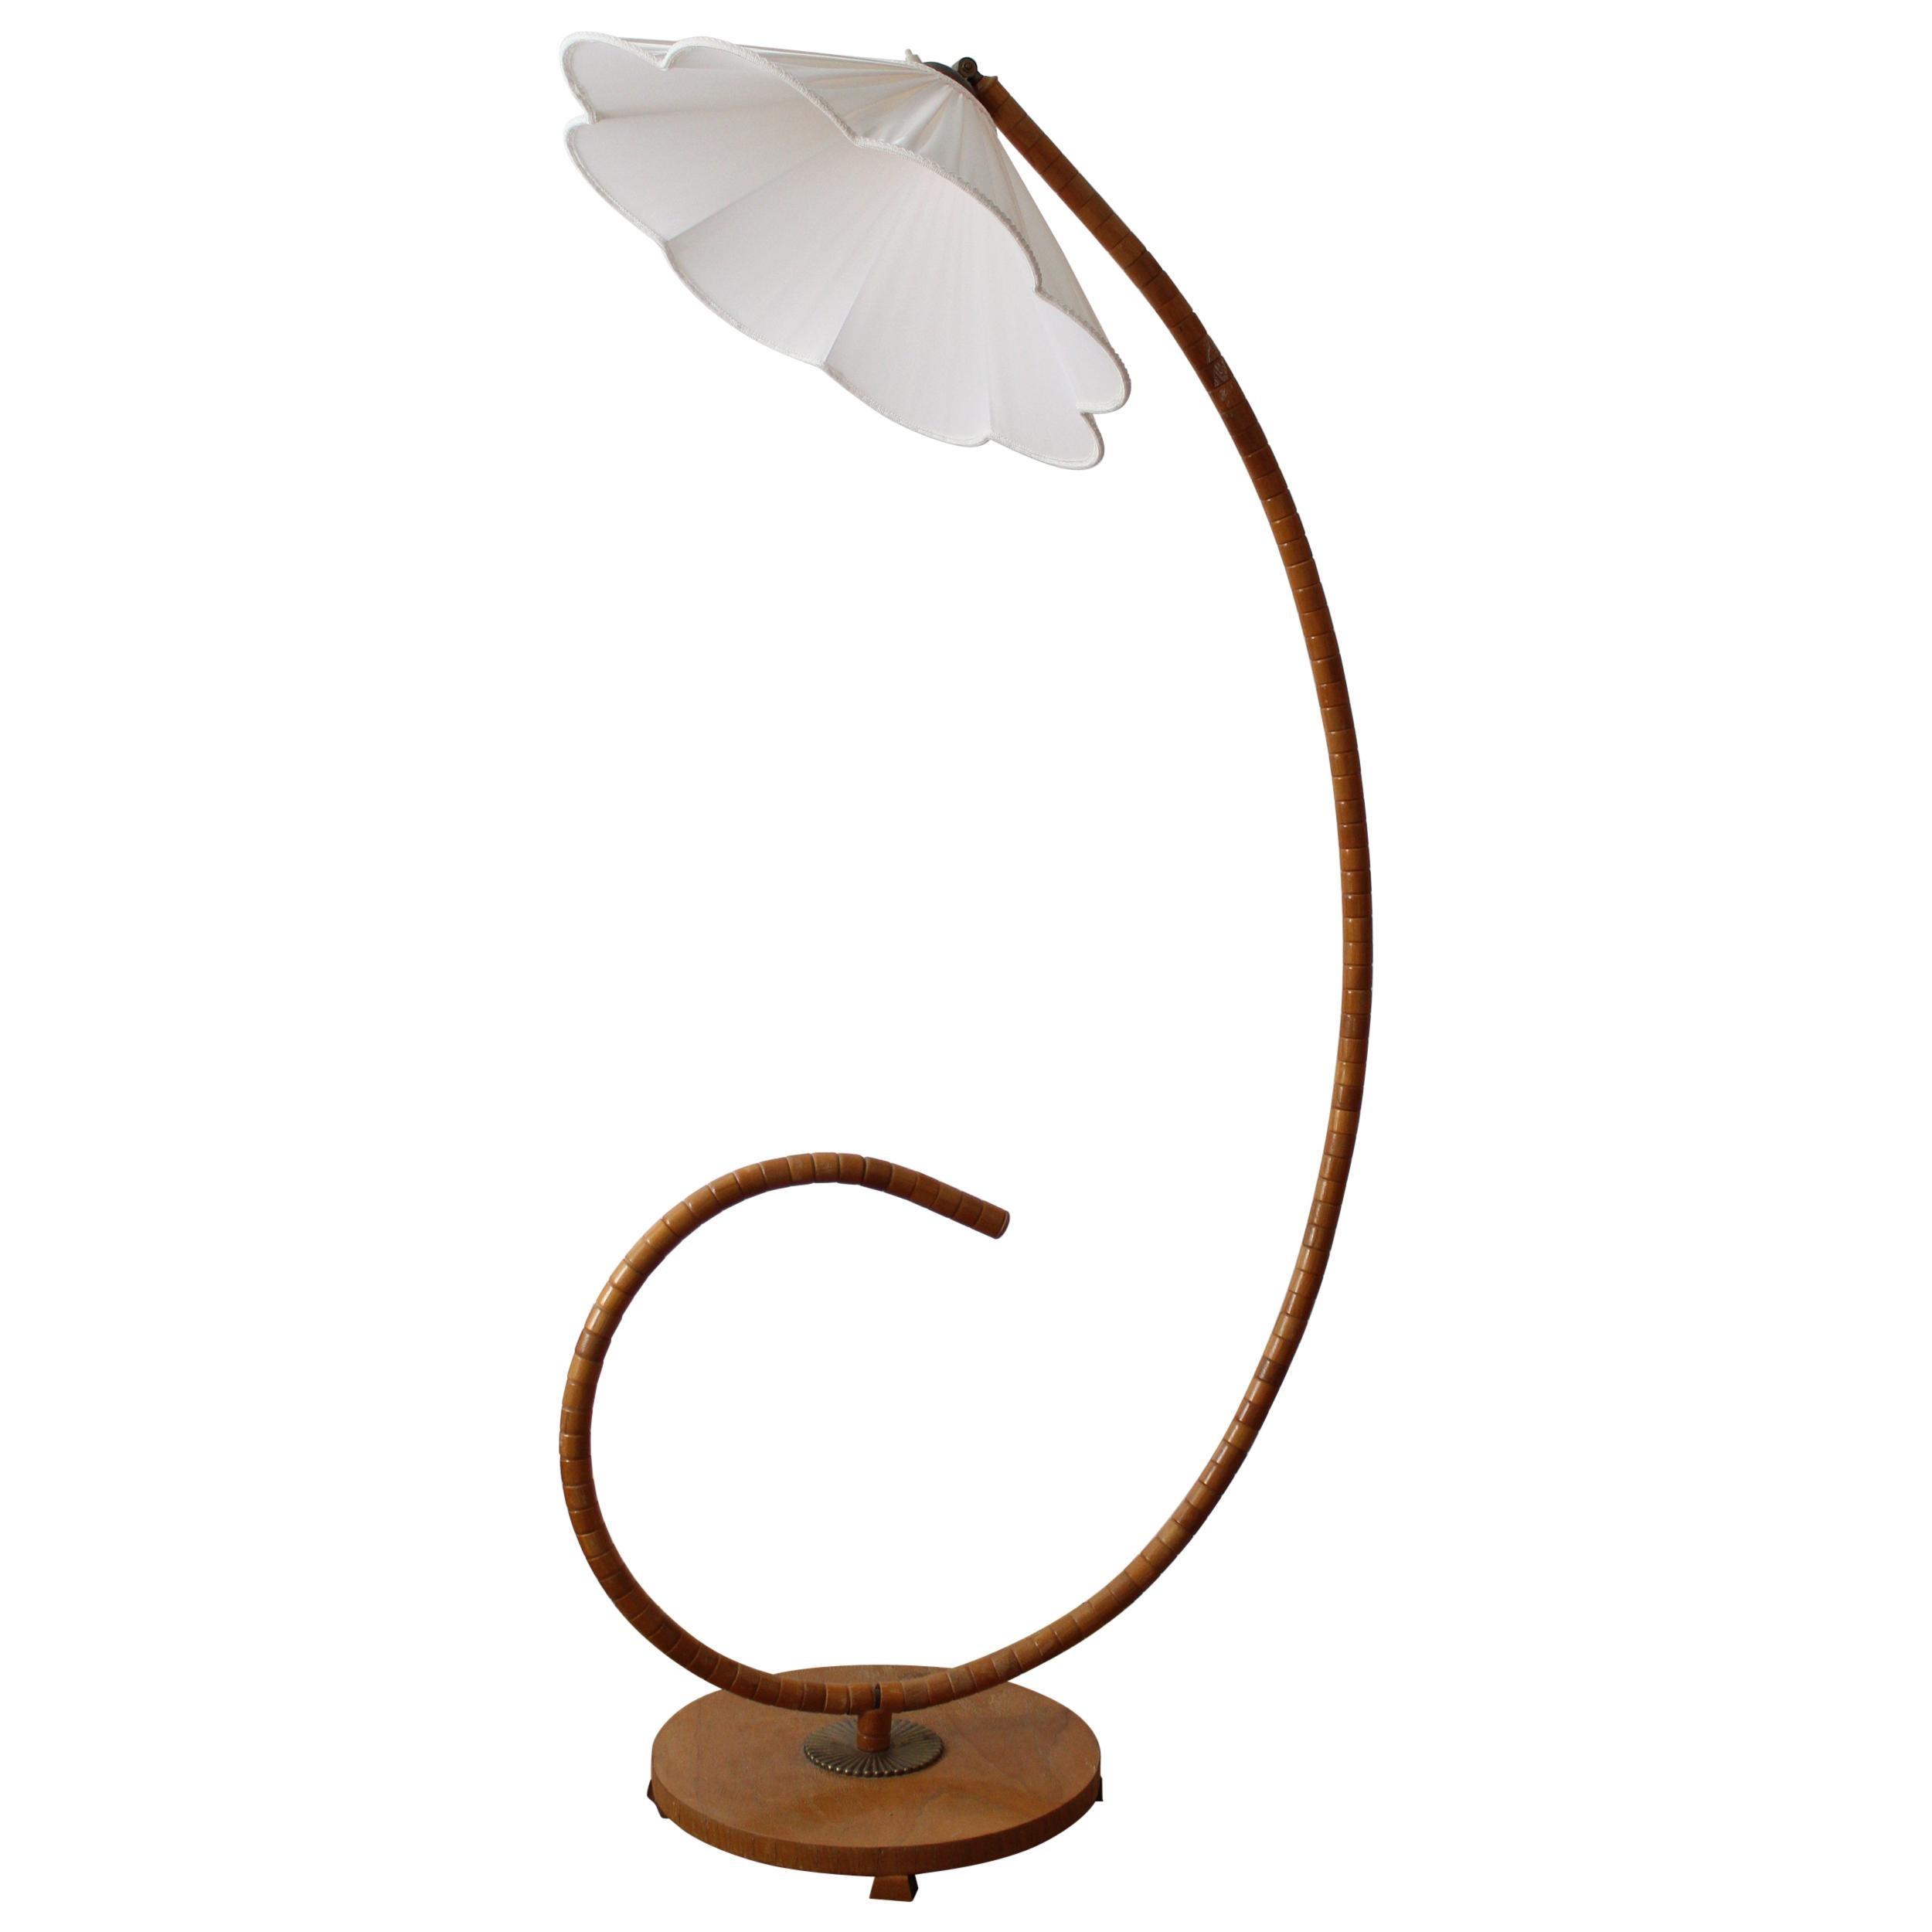 Swedish, Adjustable Organic Floor Lamp, Wood, Brass, Fabric, Sweden, 1940s